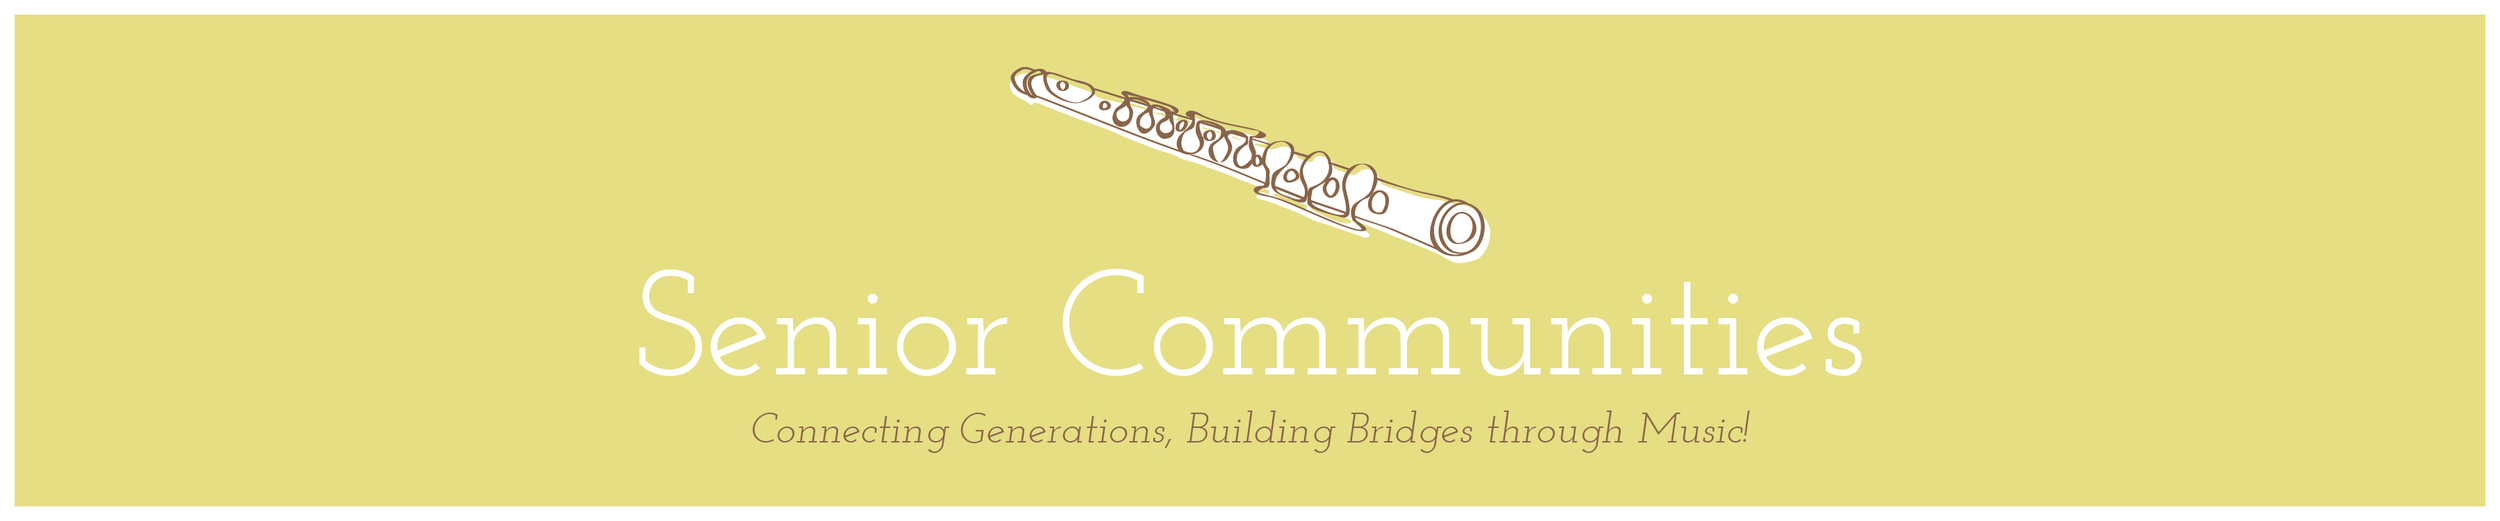 Senior-Communities-Music-Buddies.png